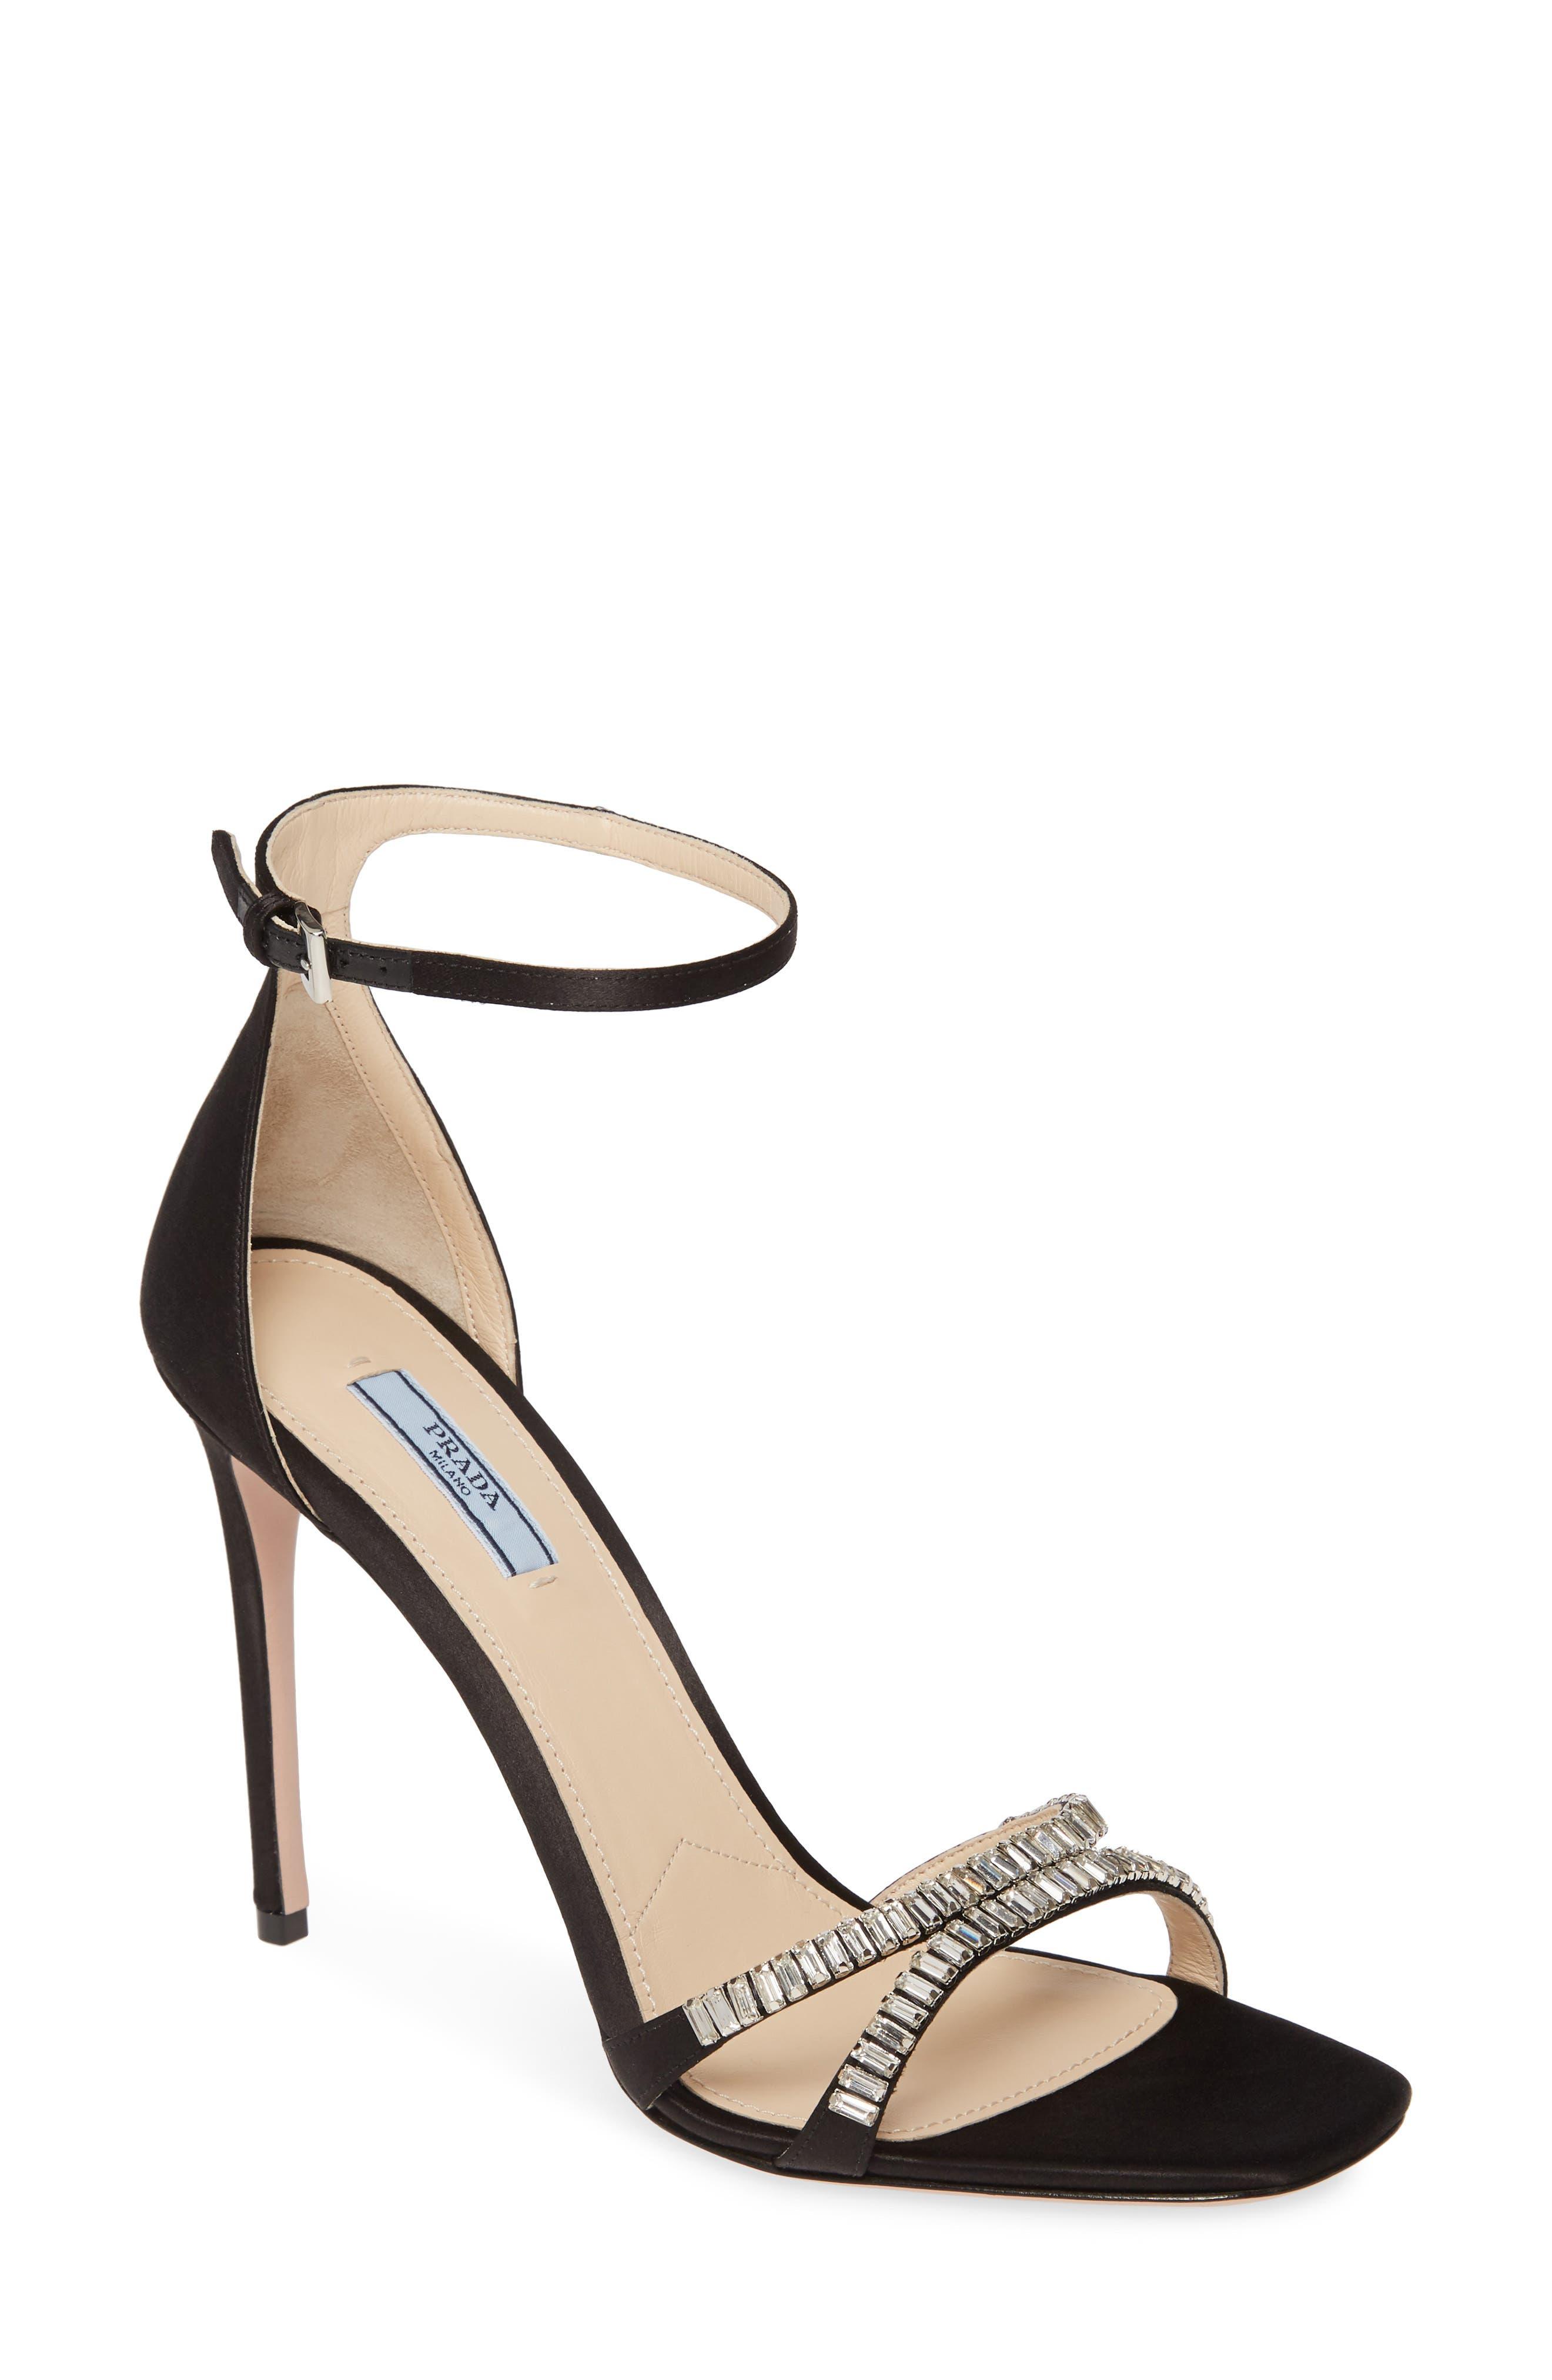 Prada Slippers Crystal Ankle Strap Stiletto Sandal